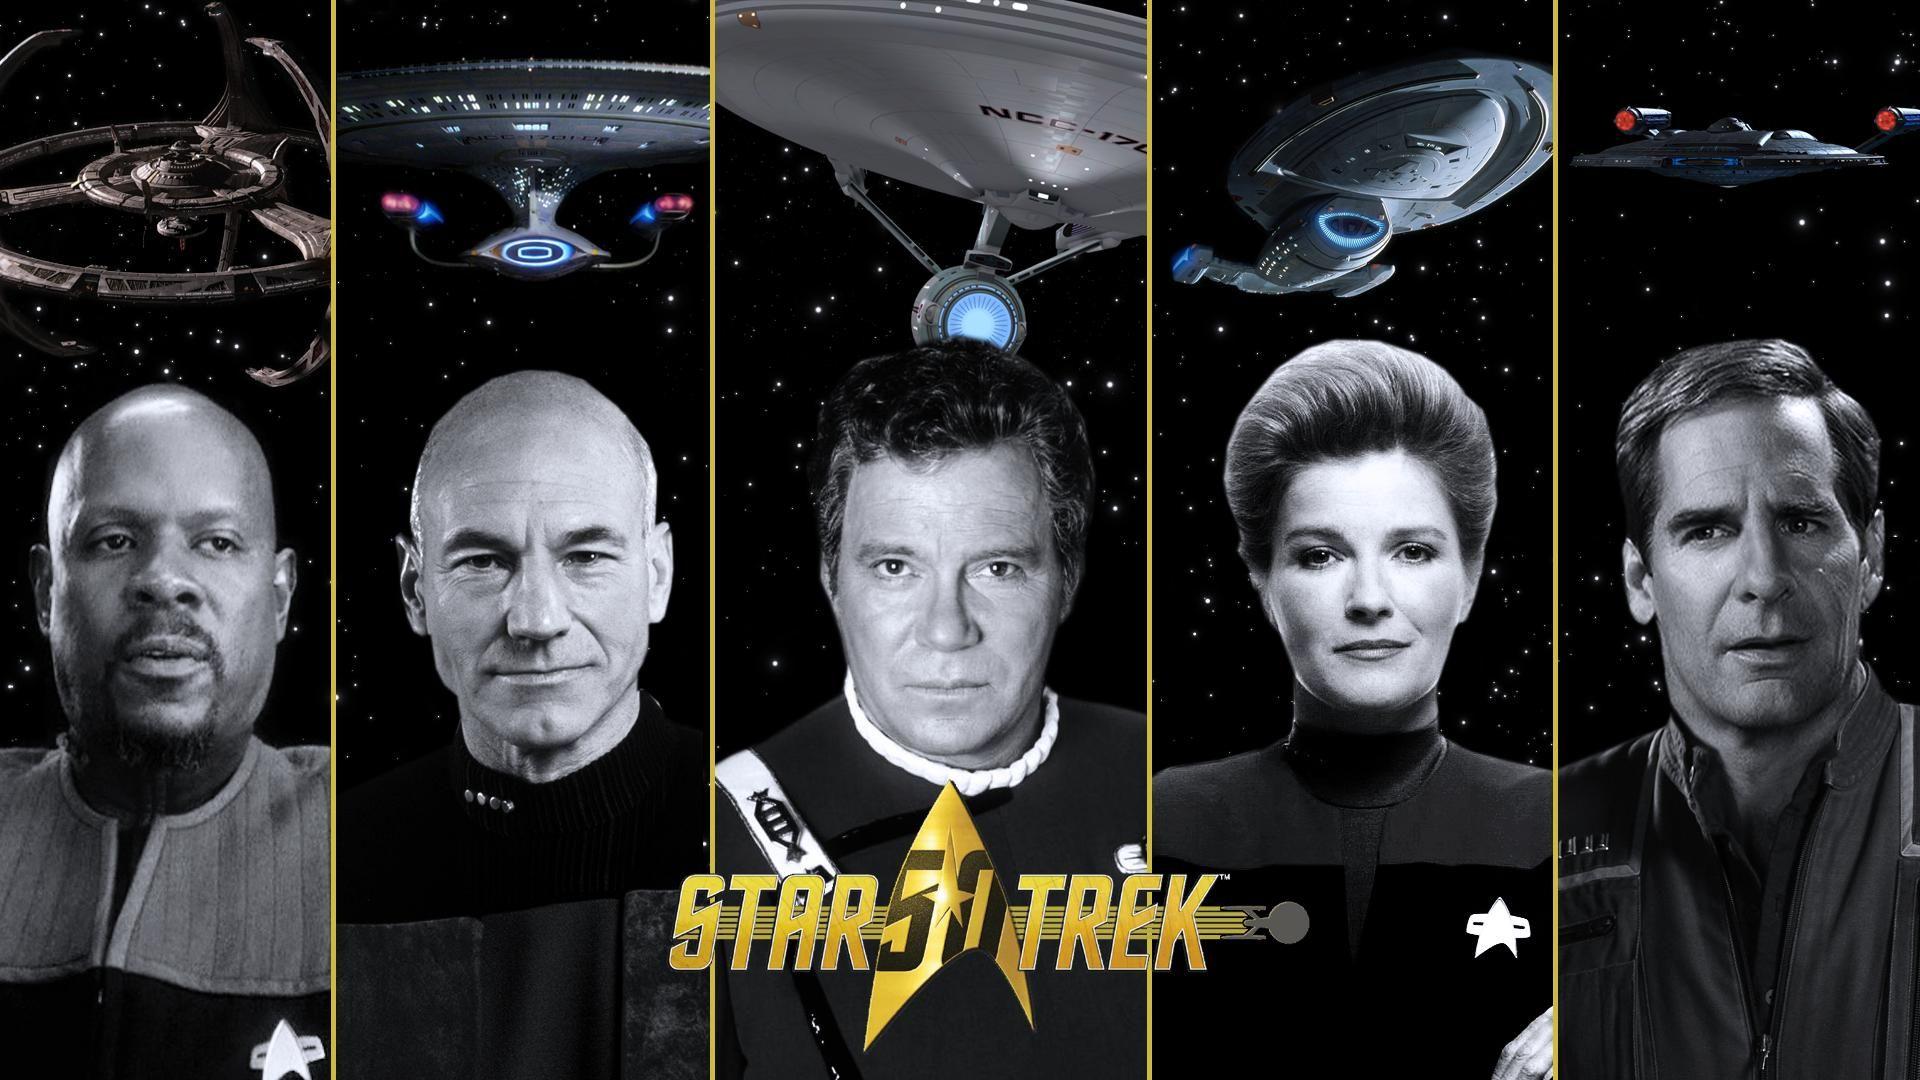 Star Trek 50th Anniversary Wallpaper [1920x1080] Need